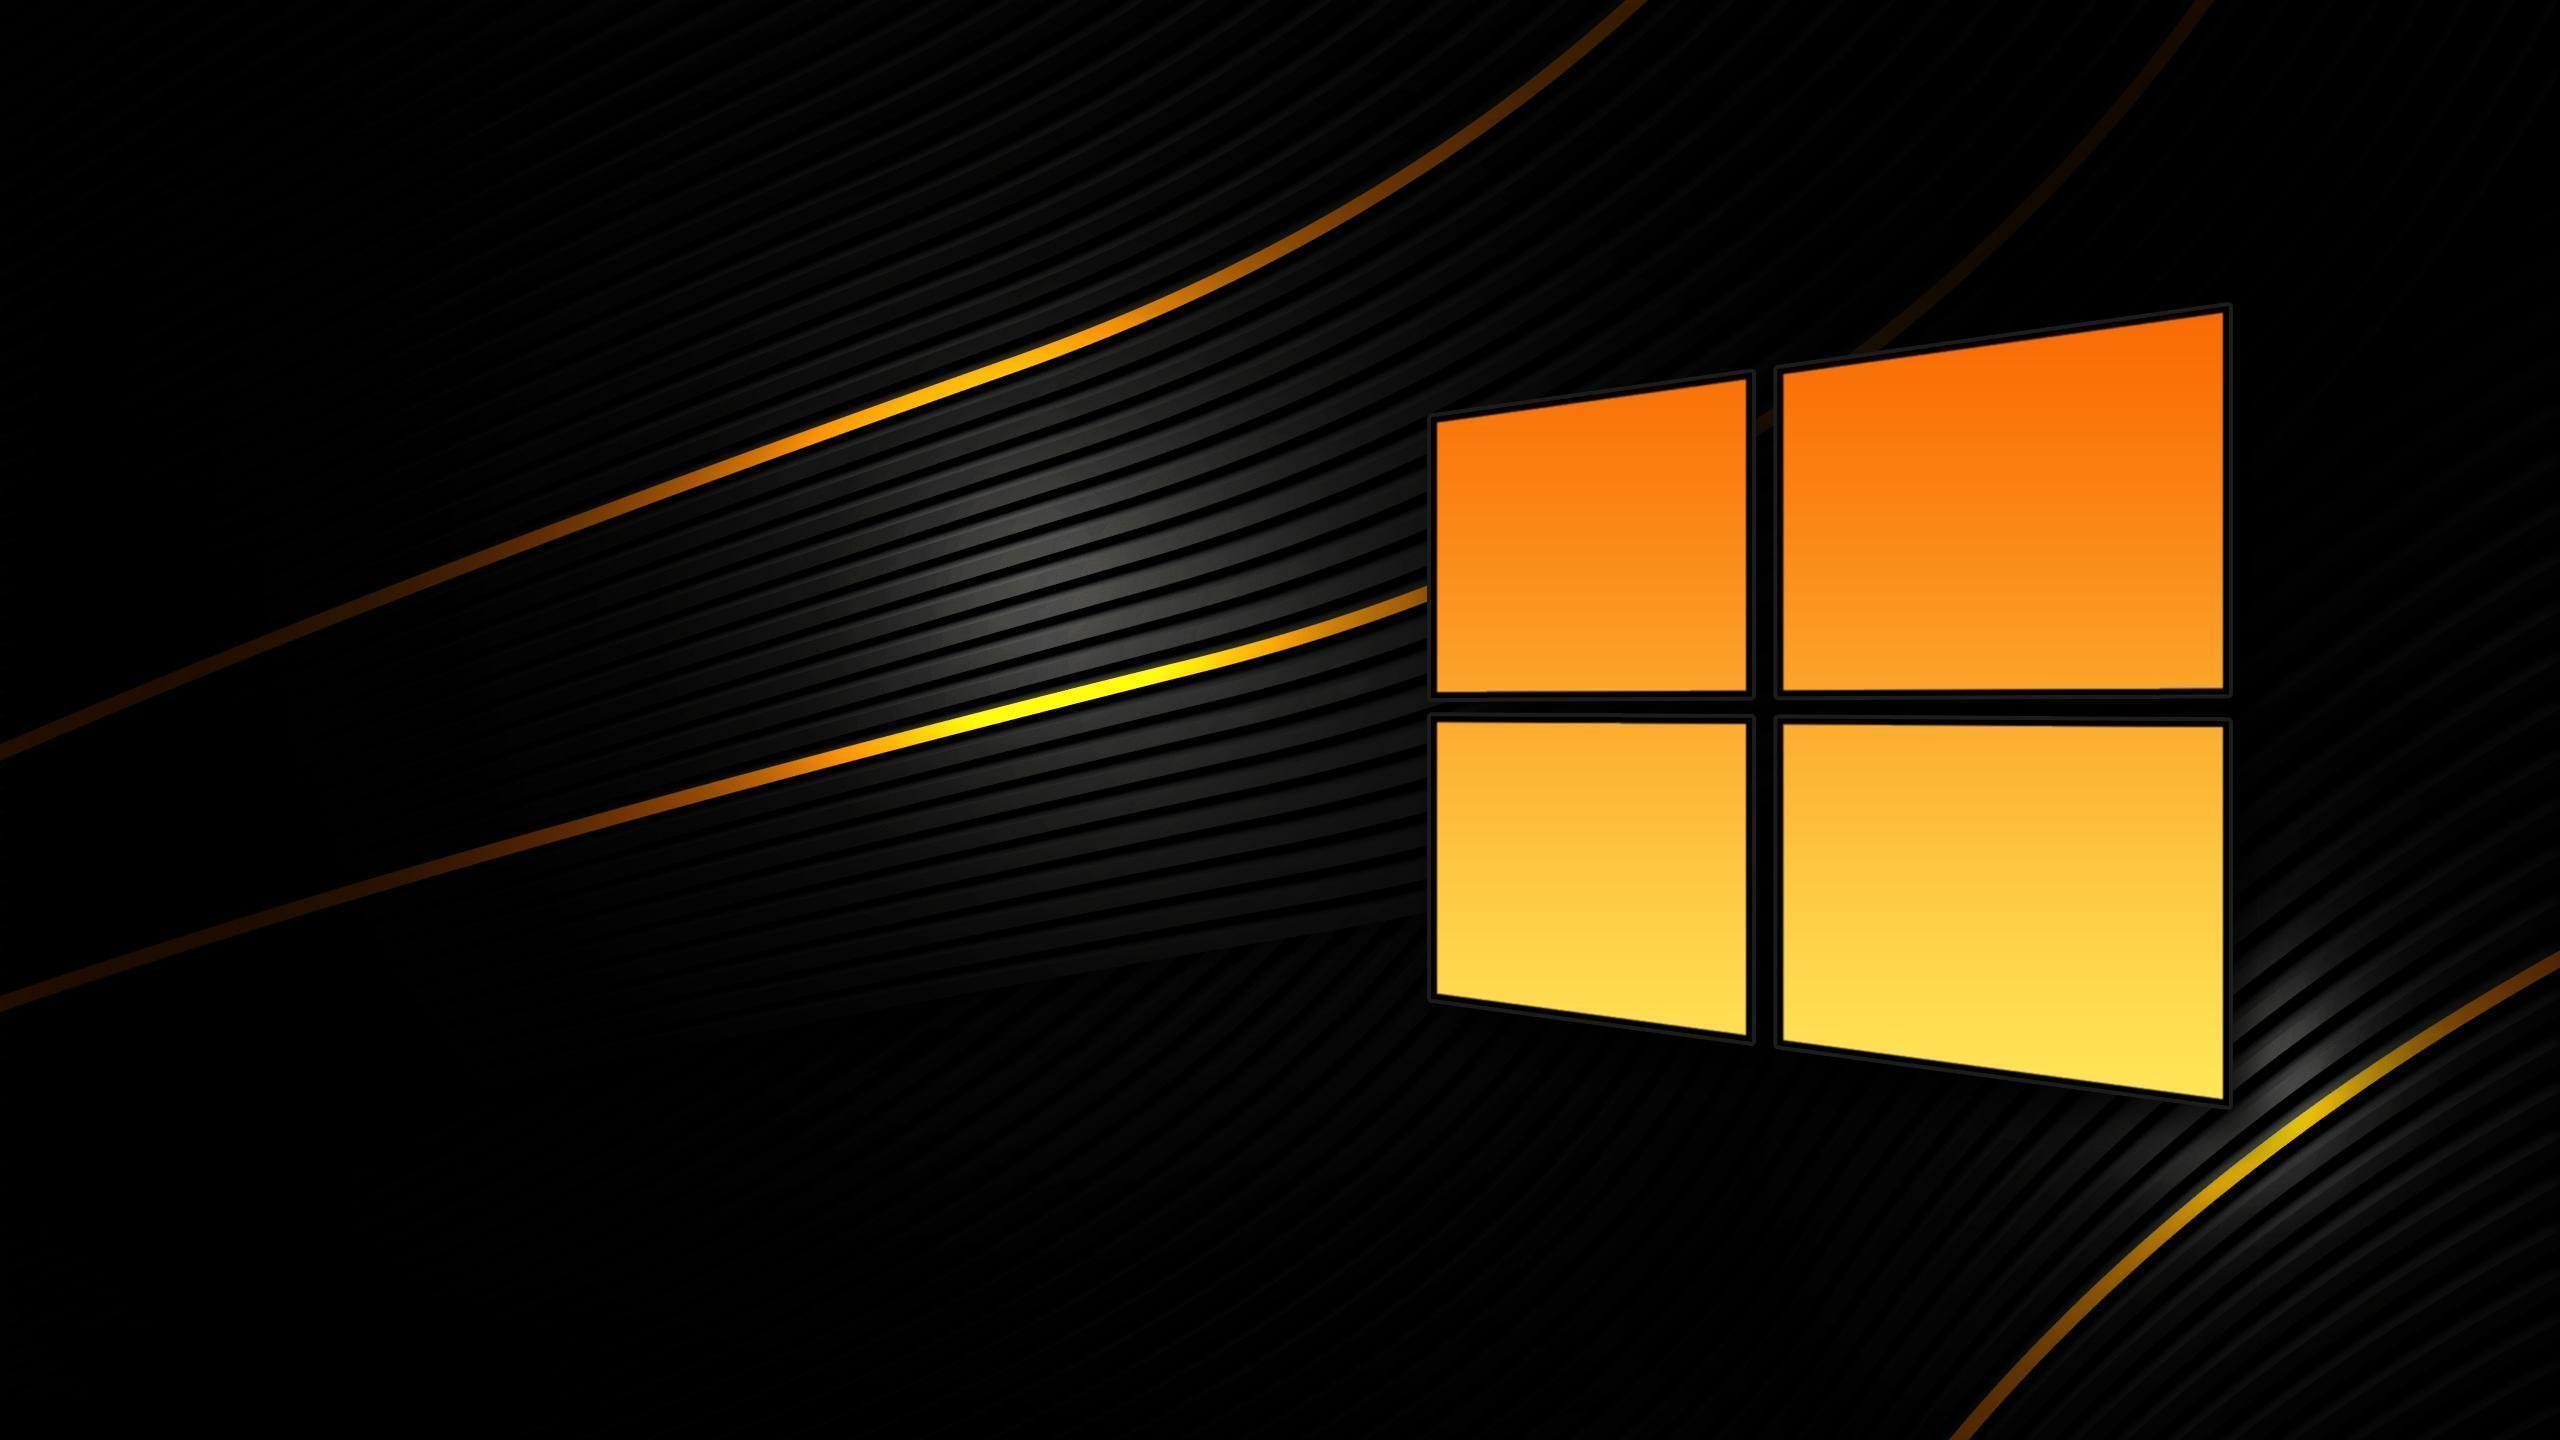 <b>Windows</b> 10 <b>Wallpapers</b